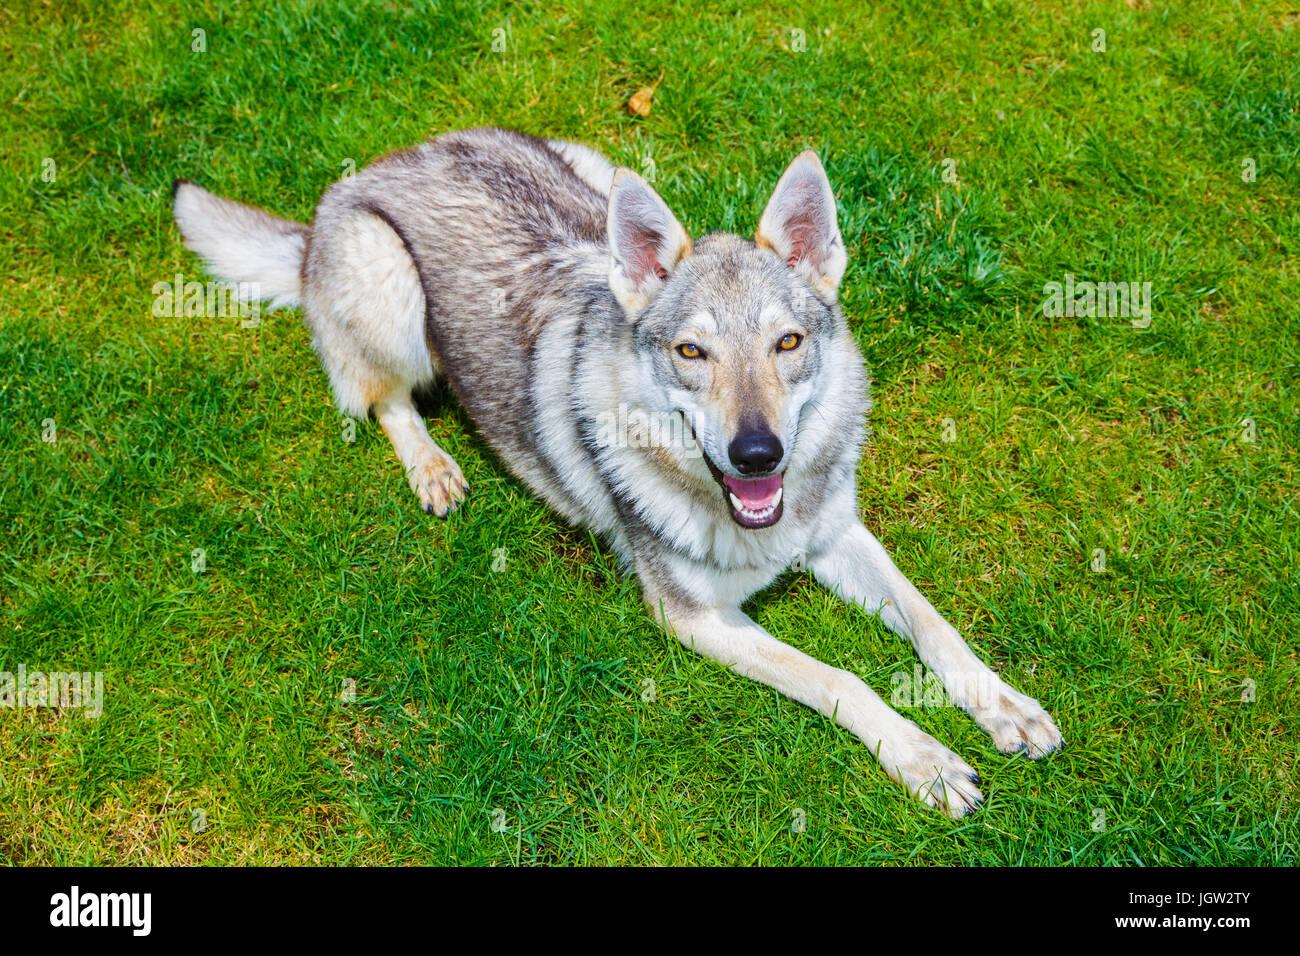 Czechoslovakian wolfdog on a garden. - Stock Image